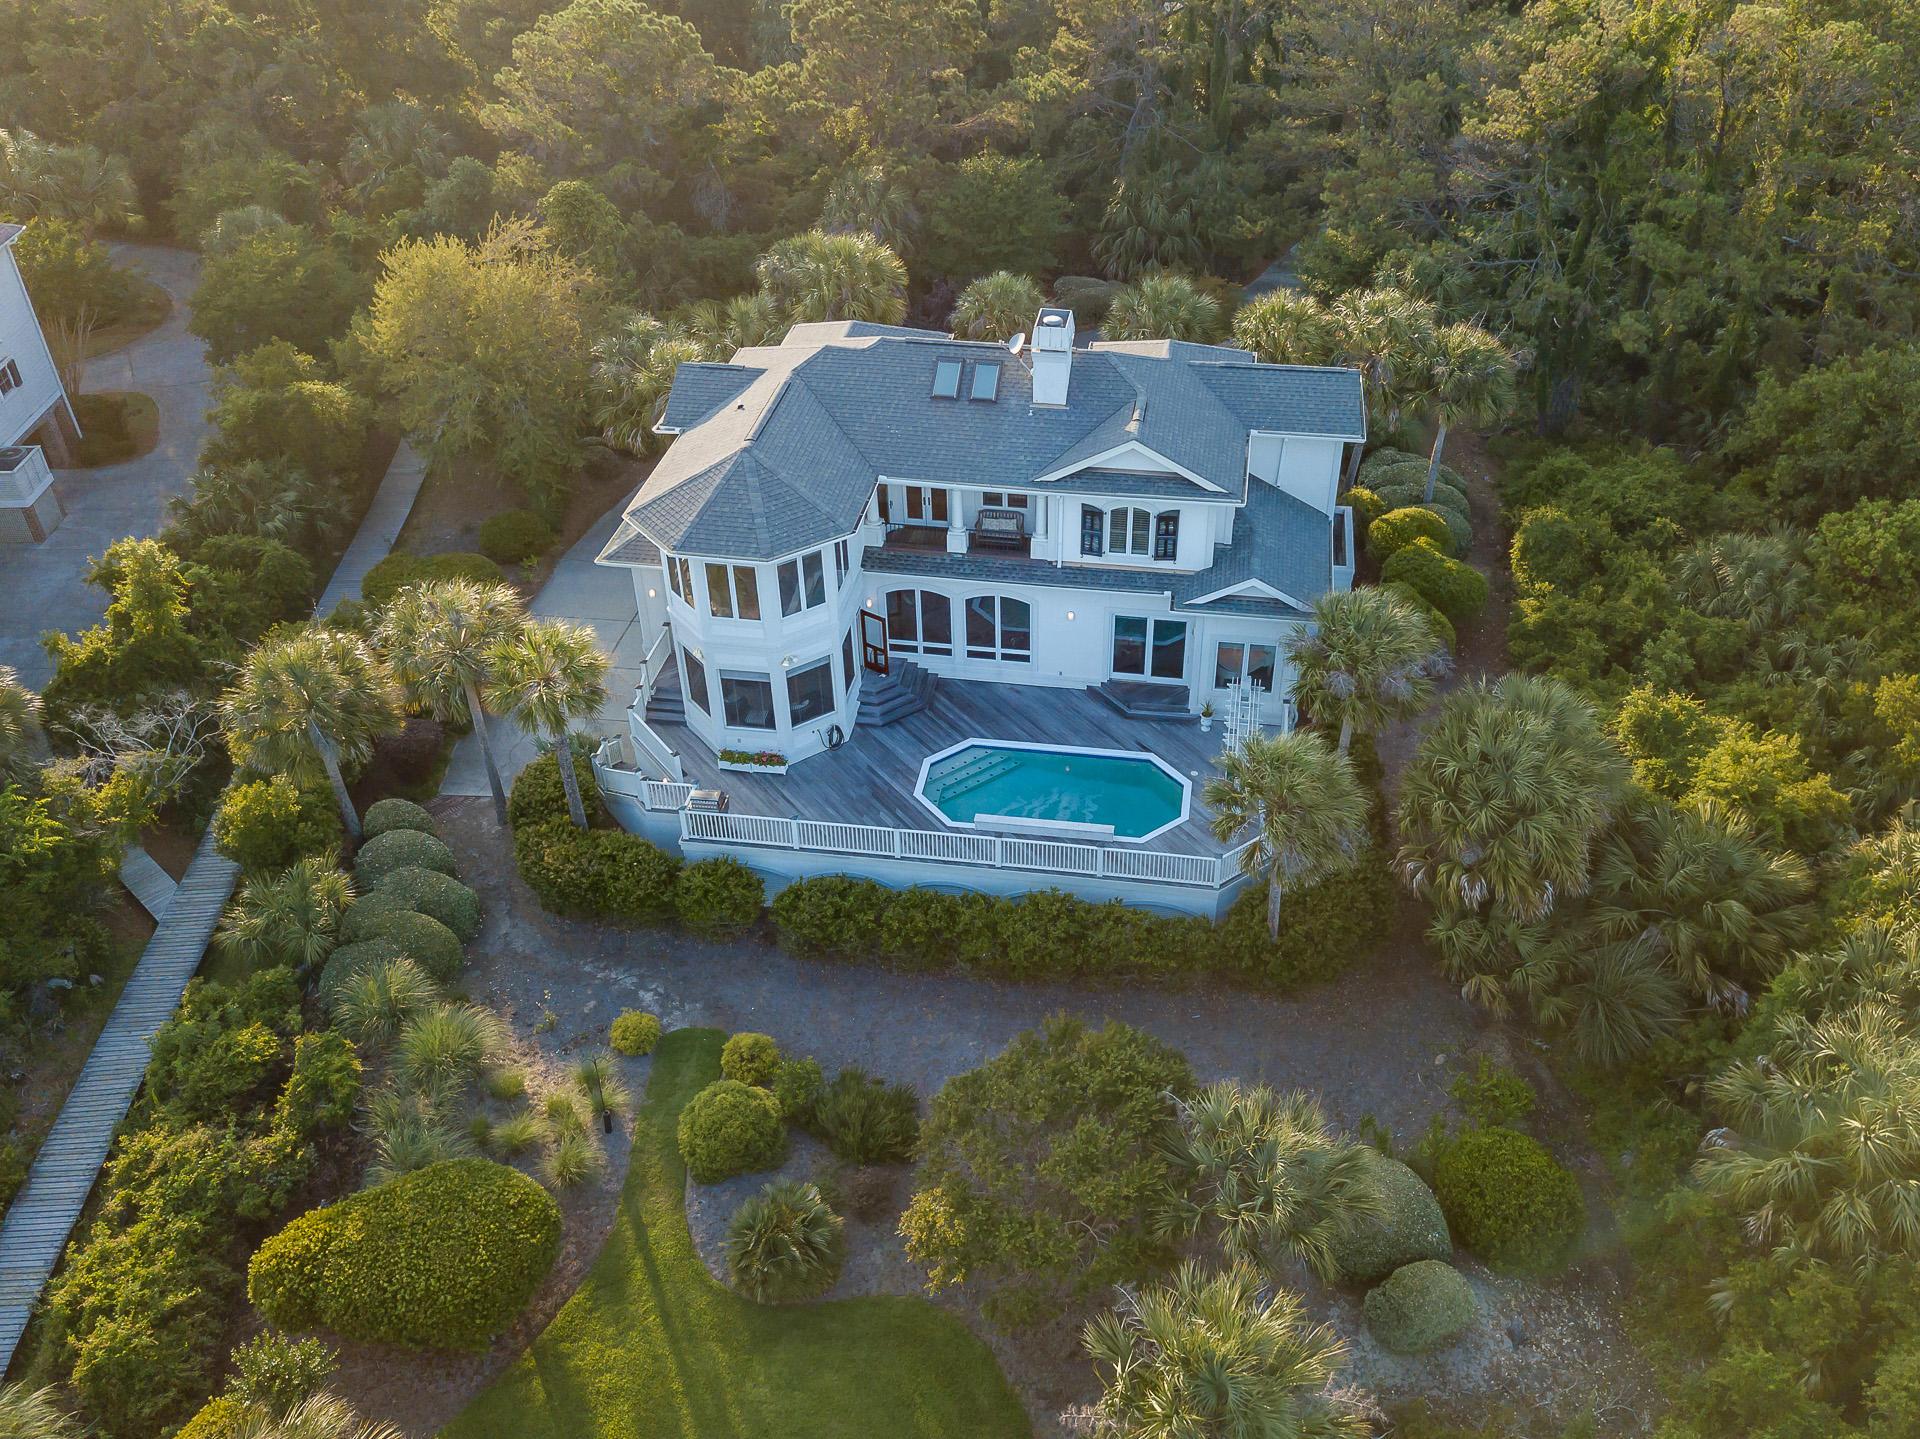 Seabrook Island Homes For Sale - 2216 Rolling Dune, Seabrook Island, SC - 2